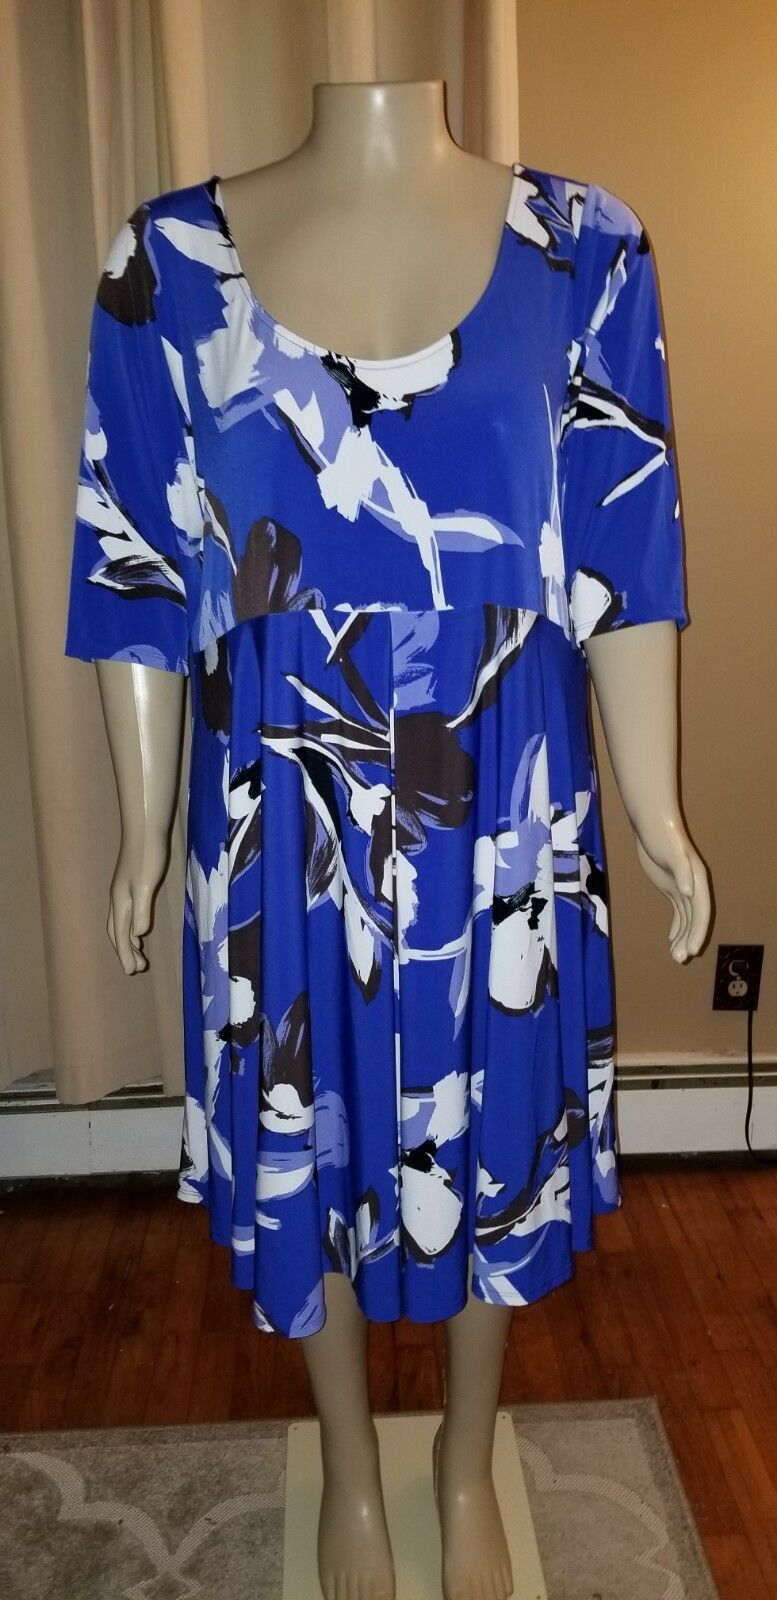 Lane Bryant Scoop Neck Short Sleeve Blau Floral Dress 26 28 NWT